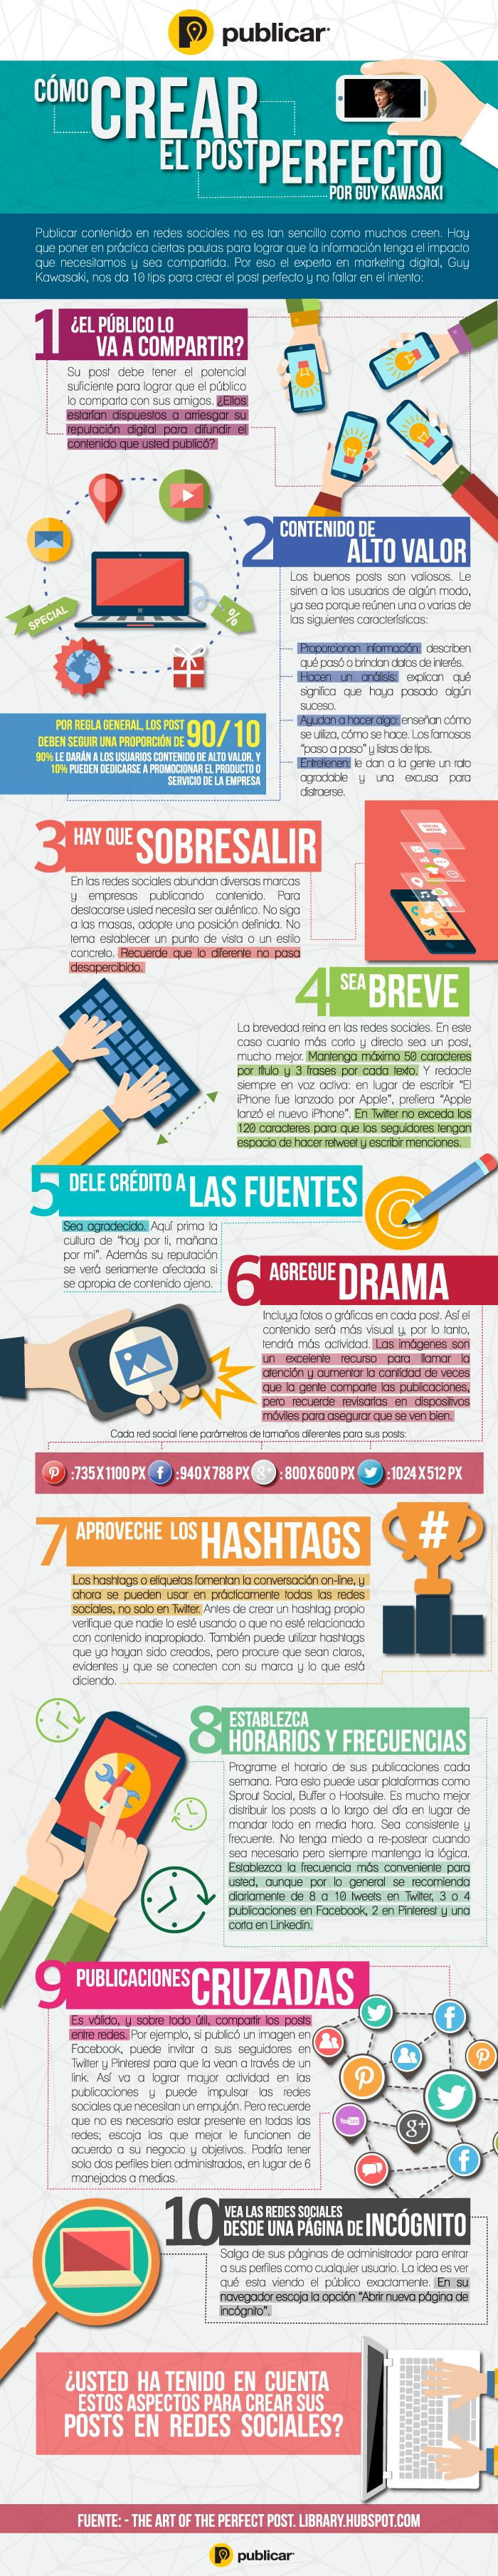 Cómo crear el post perfecto según Guy Kawasaki #infografia #infographic #socialmedia